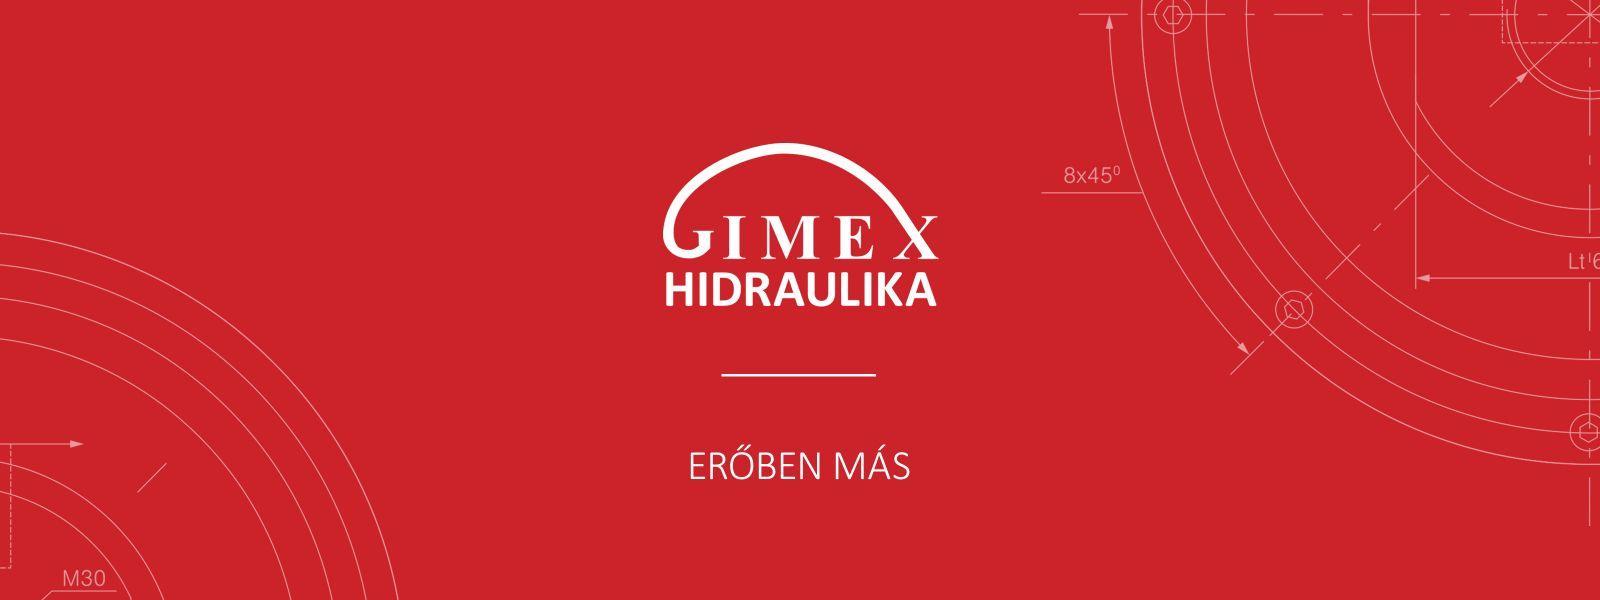 Gimex_Eroben_mas!